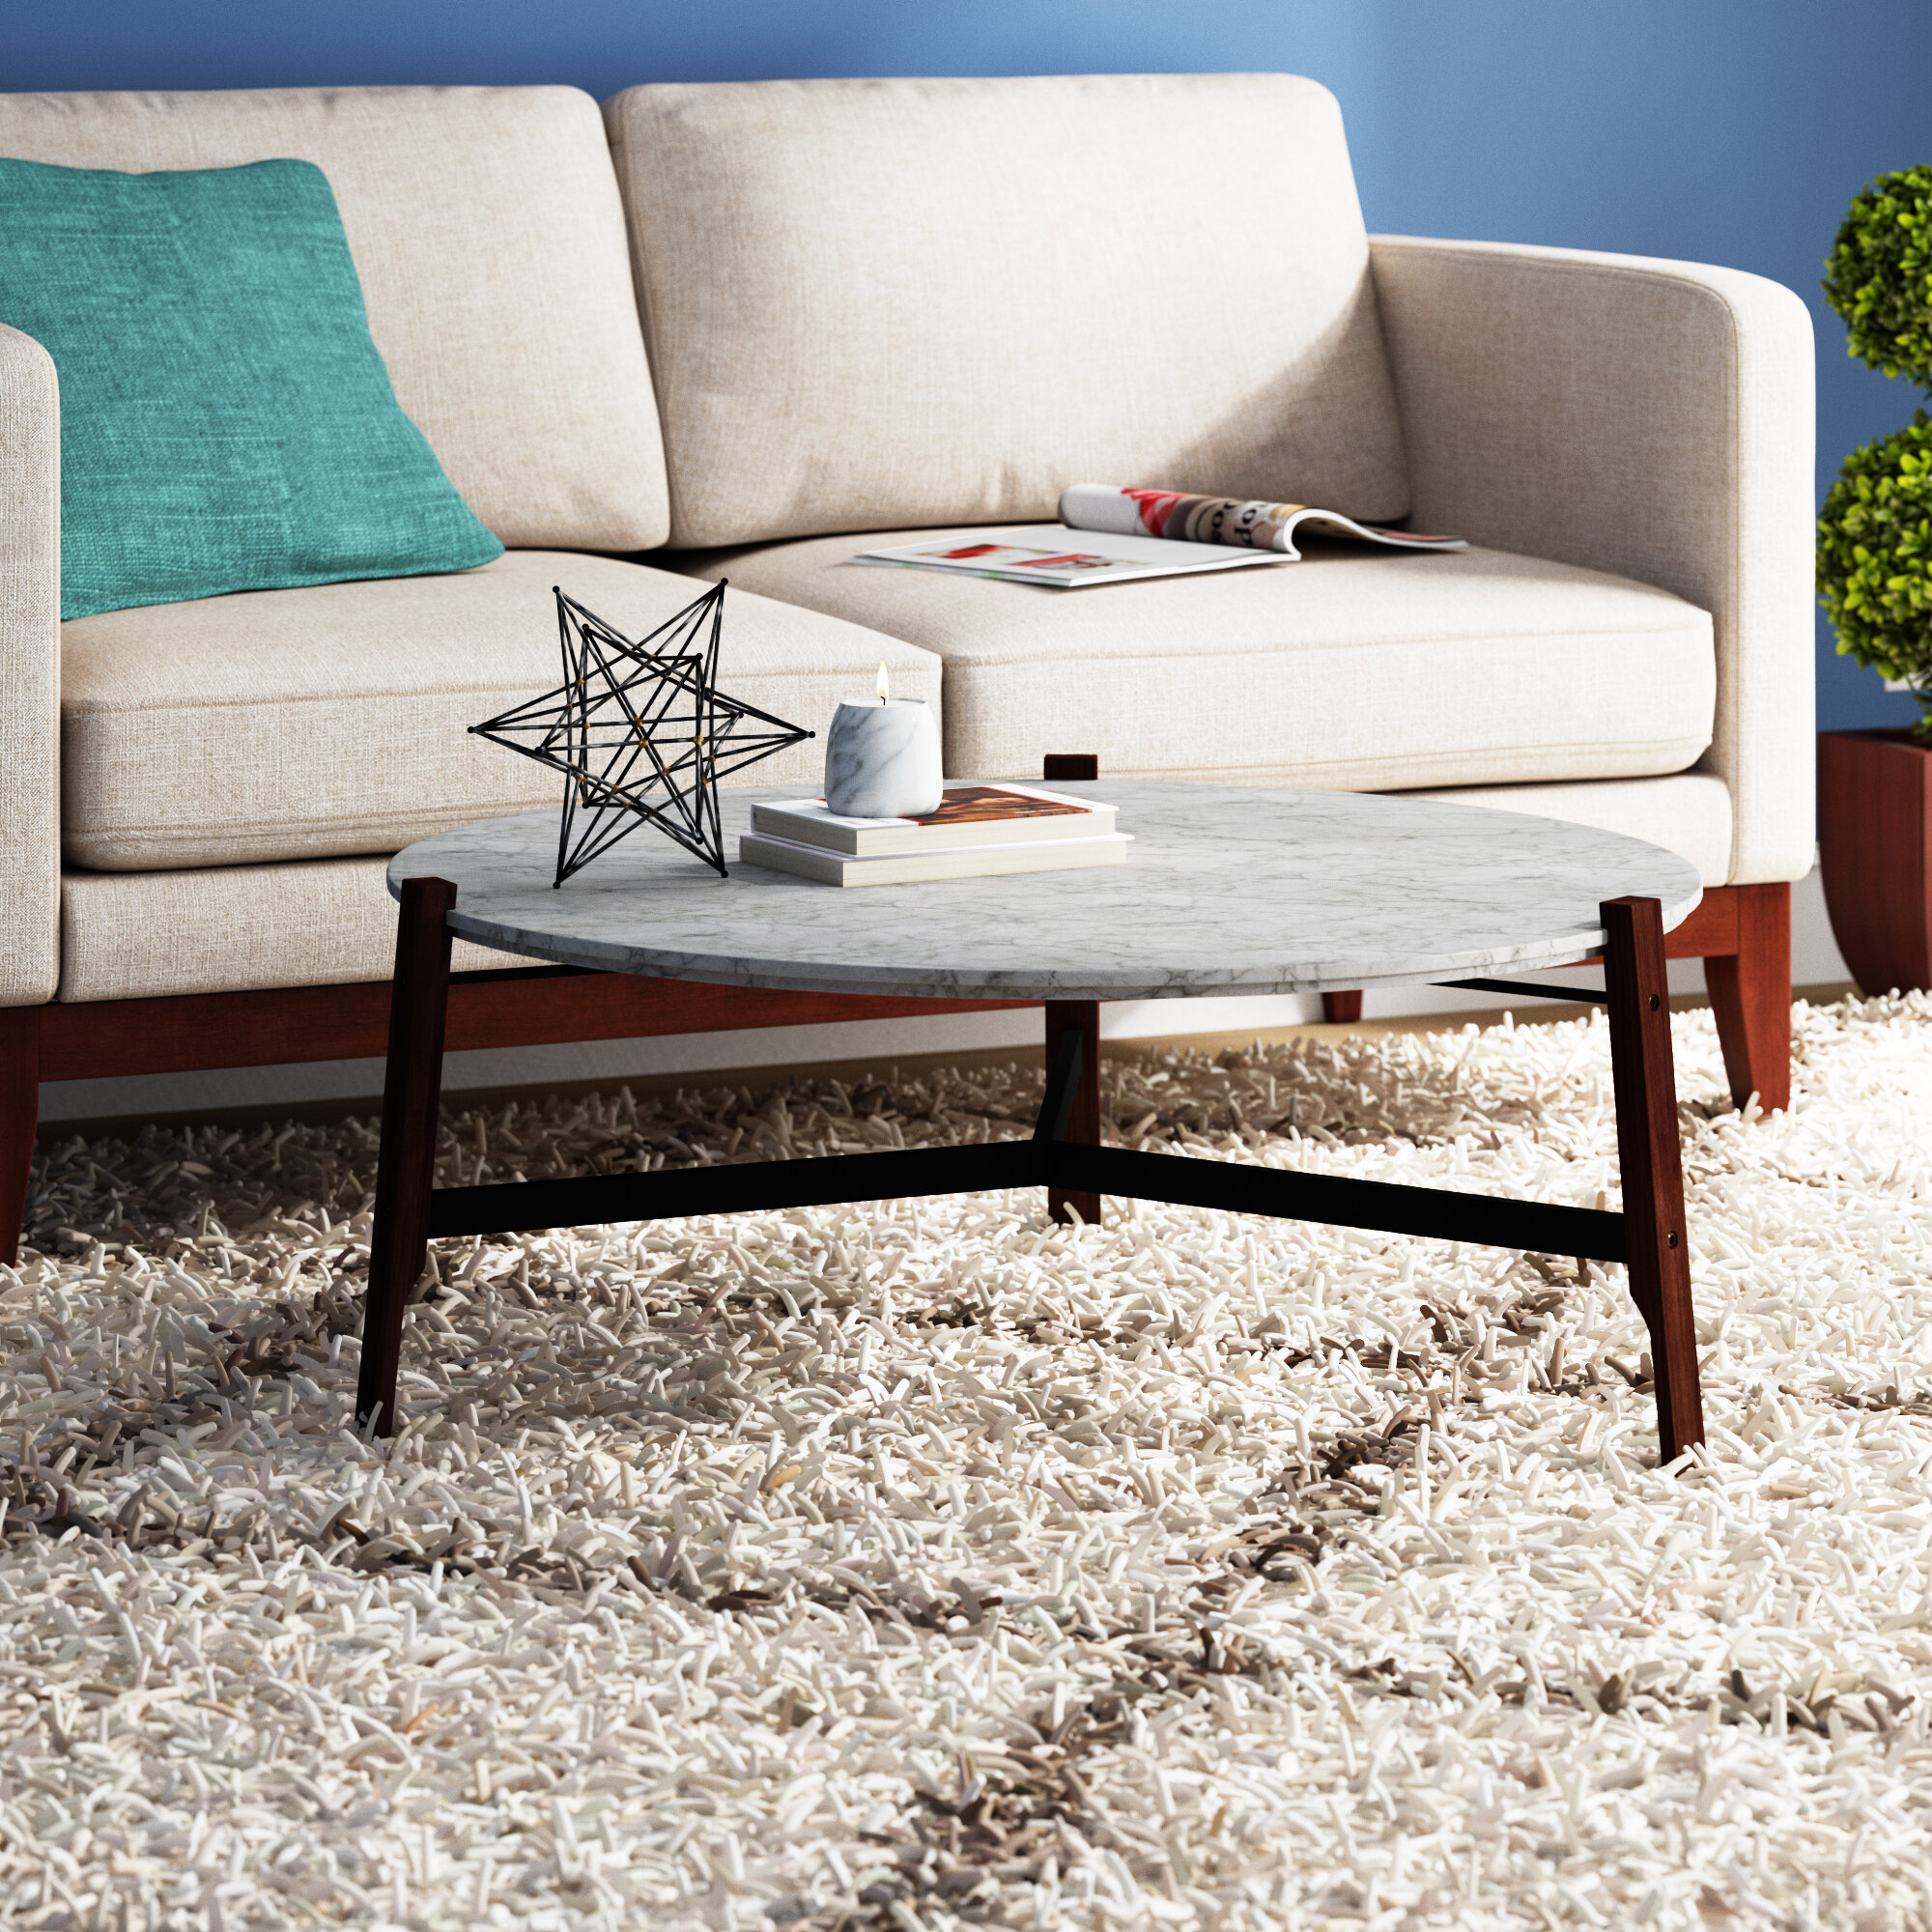 Groovy Free Range Coffee Table Ibusinesslaw Wood Chair Design Ideas Ibusinesslaworg